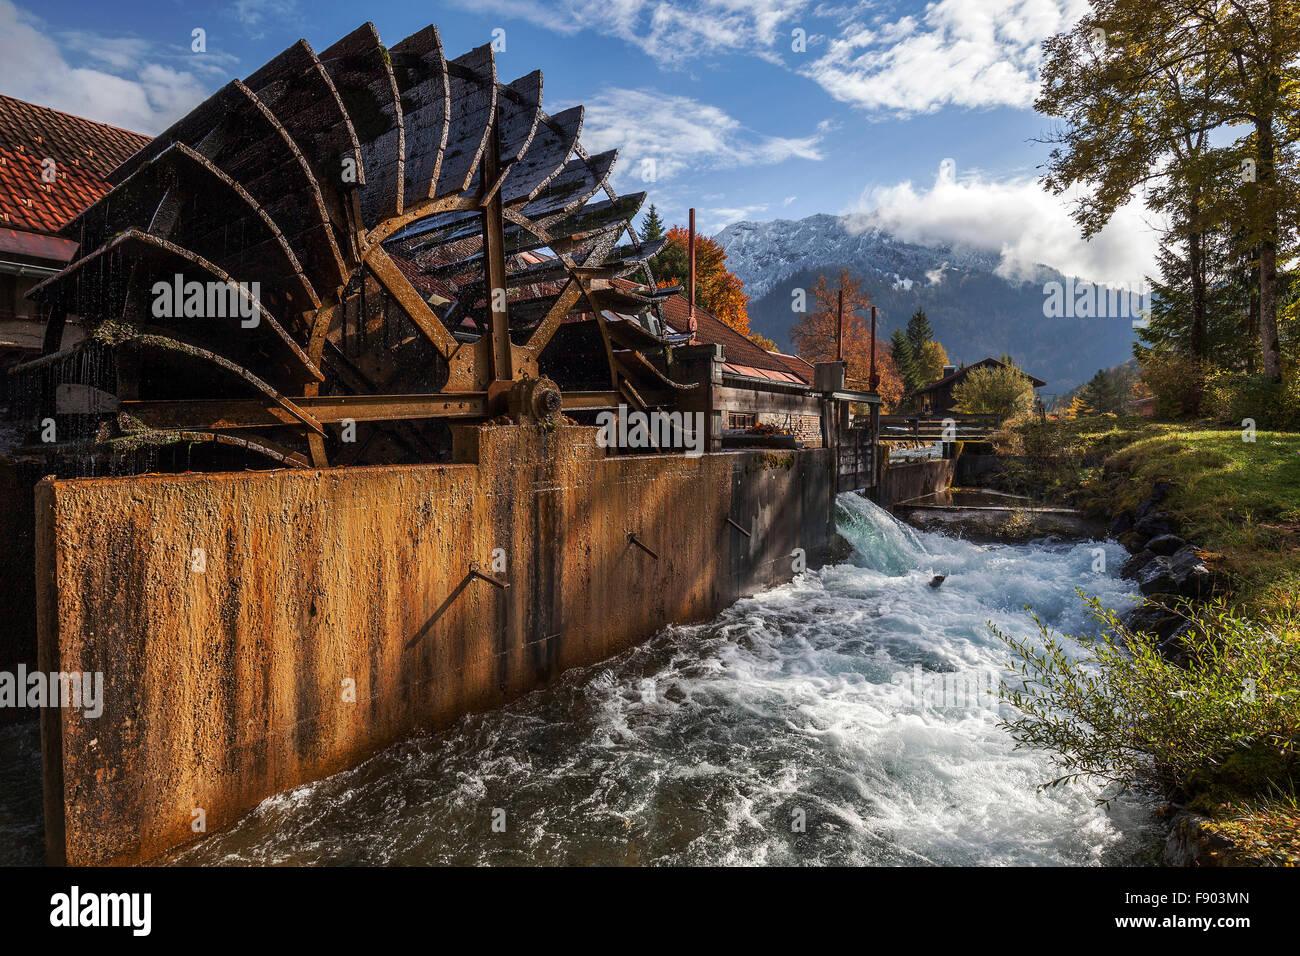 Historical hammer mill, water wheel in the Ostrich stream, Bad Oberdorf in Bad Hindelang, Allgäu, Bavaria, - Stock Image